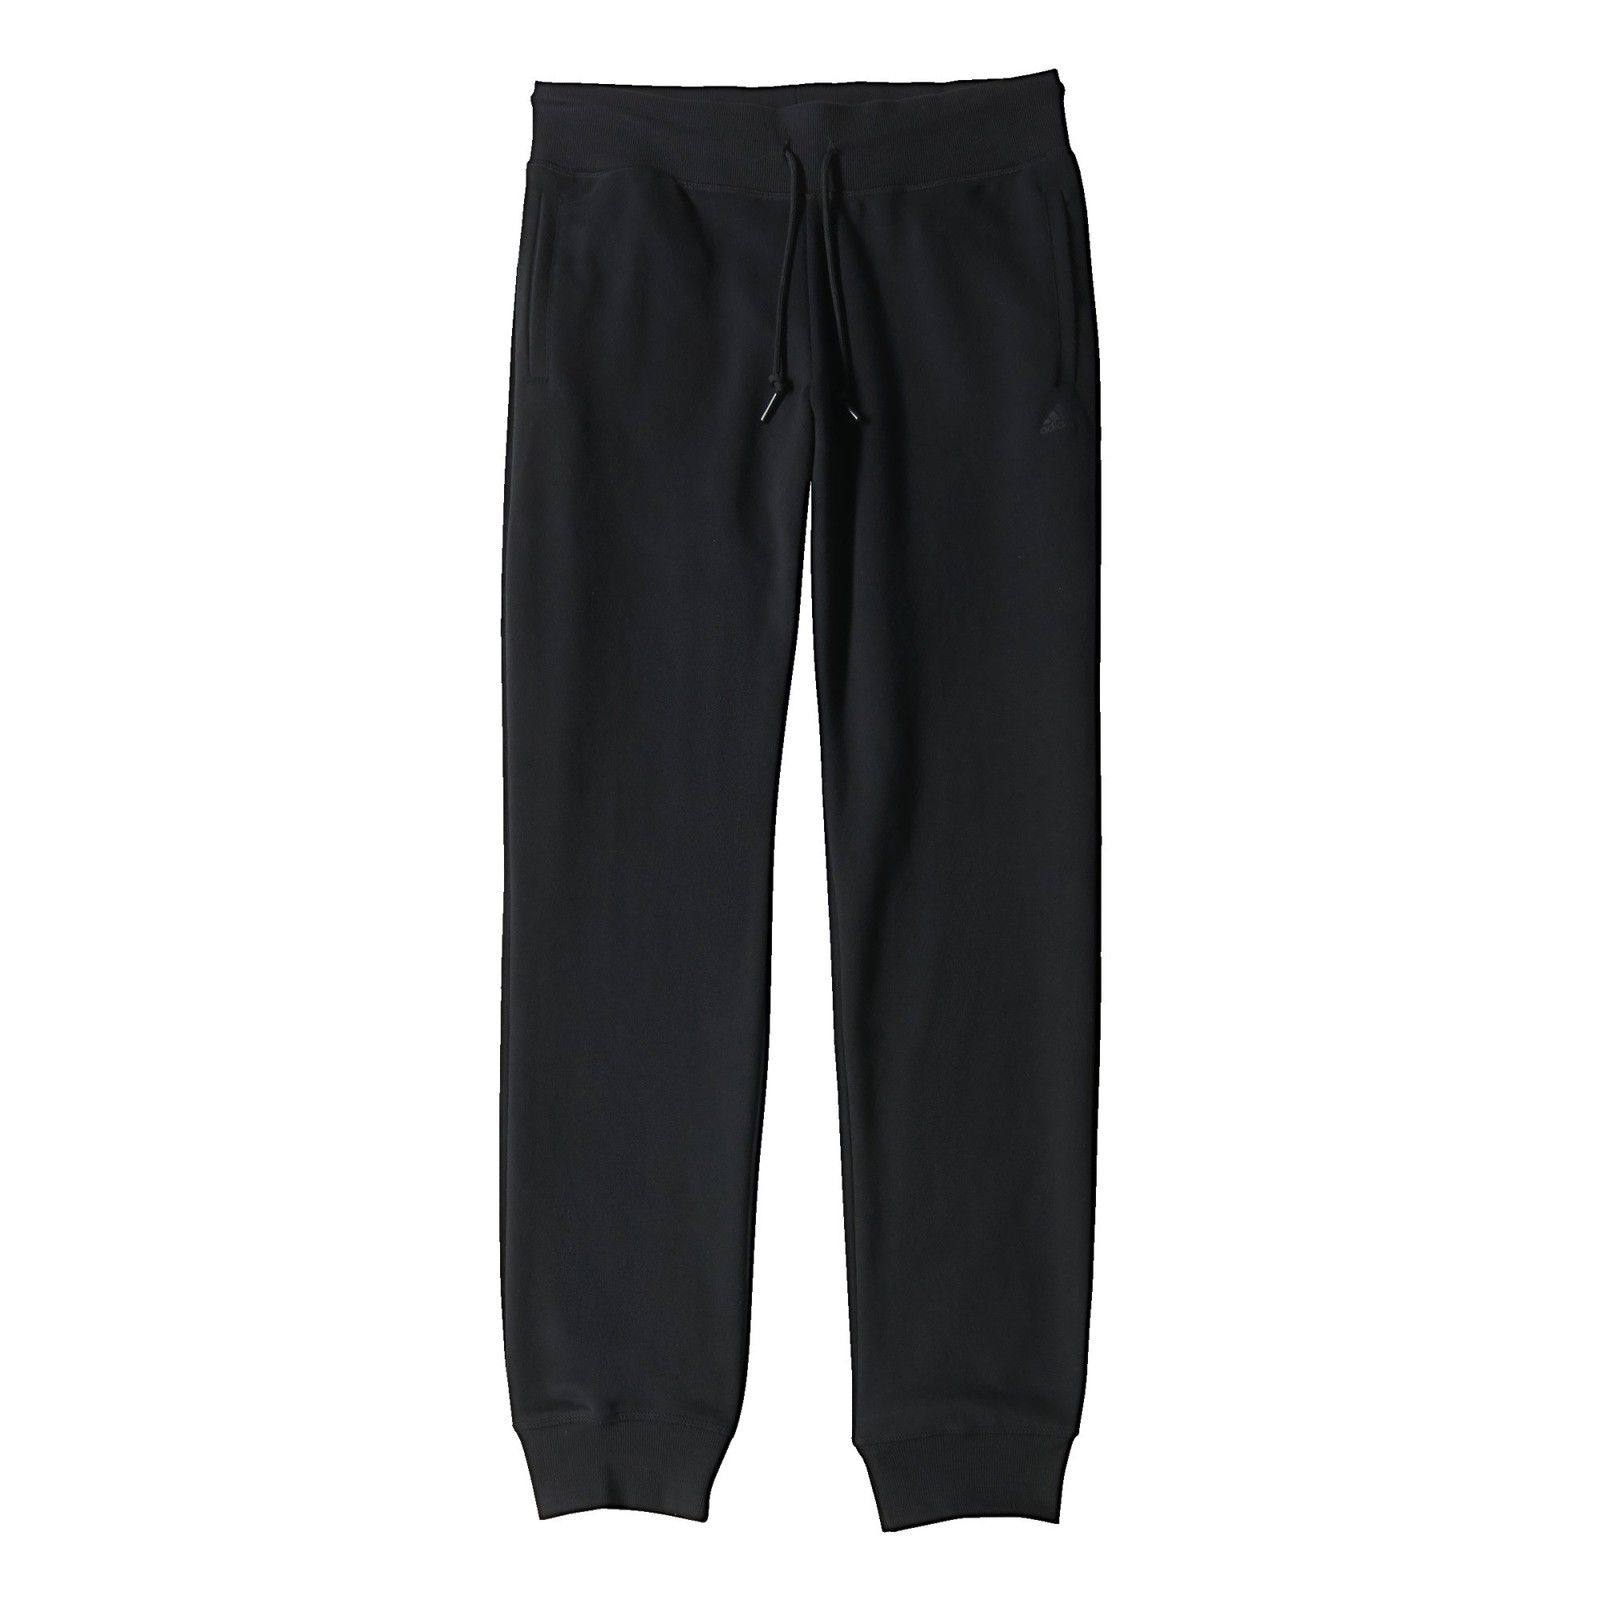 ADIDAS Damen Trainingshose Ess Cuffed Pants Sporthose Gymnastikhose Fitnesshose